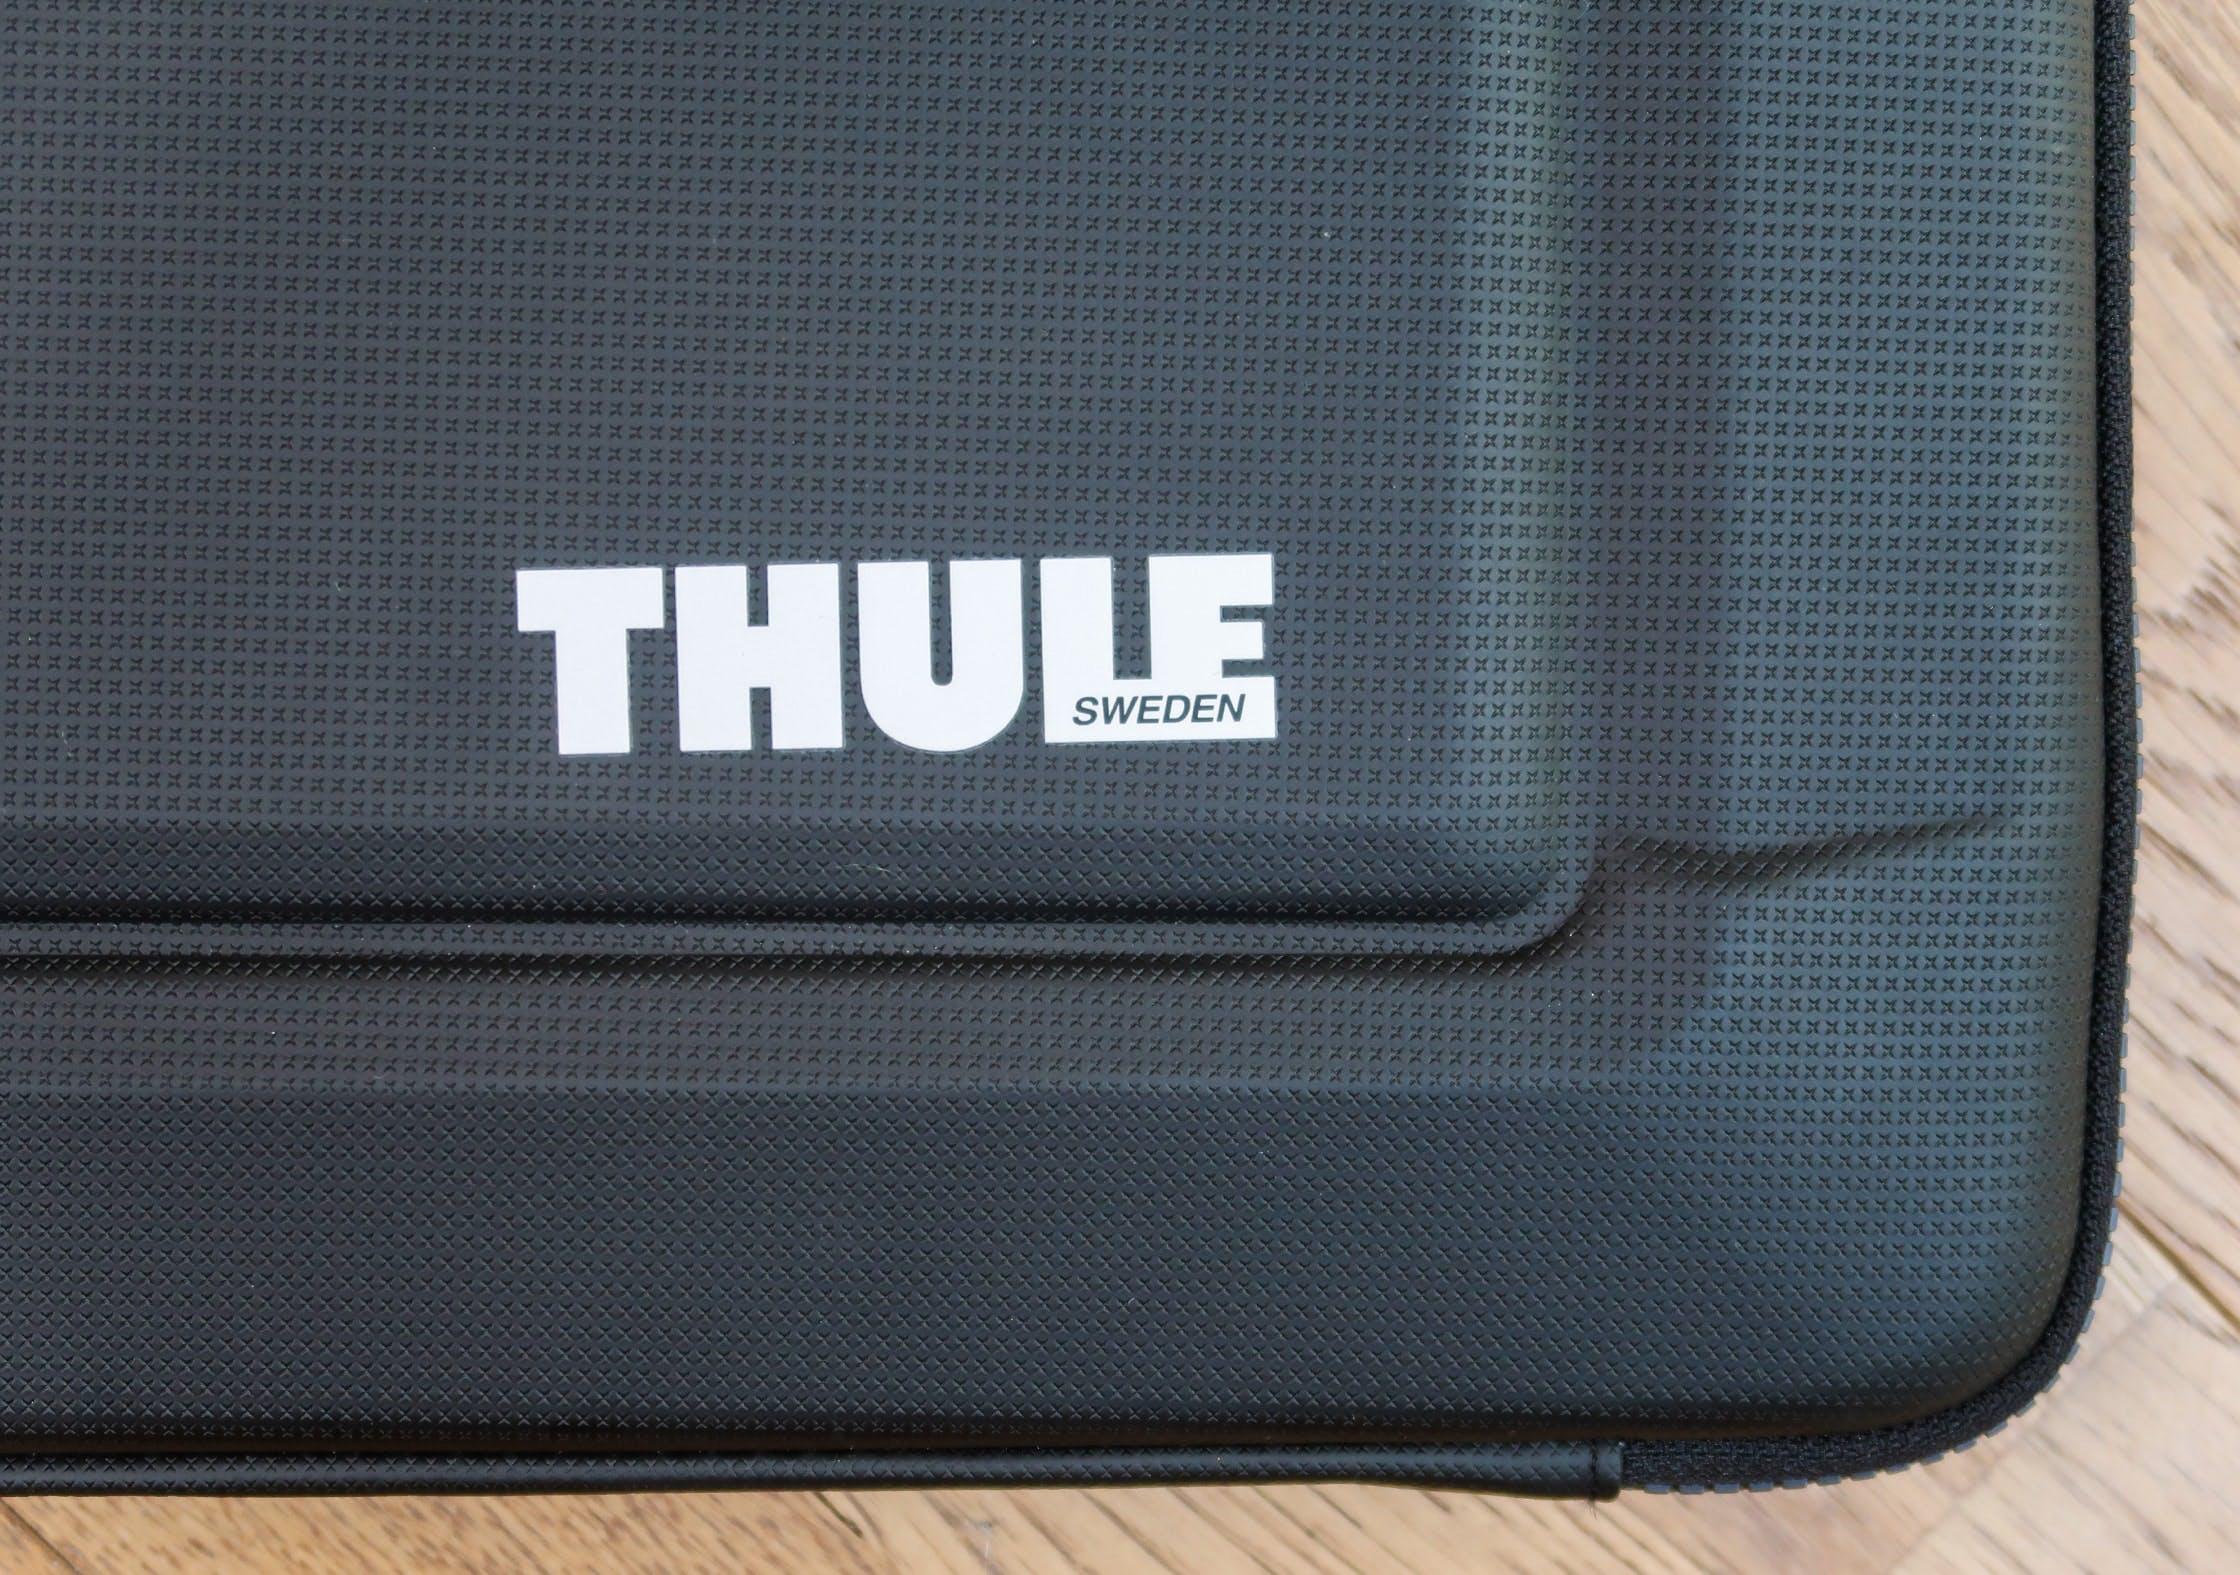 Wonky Thule Logo On The Gauntlet 3.0 Laptop Sleeve